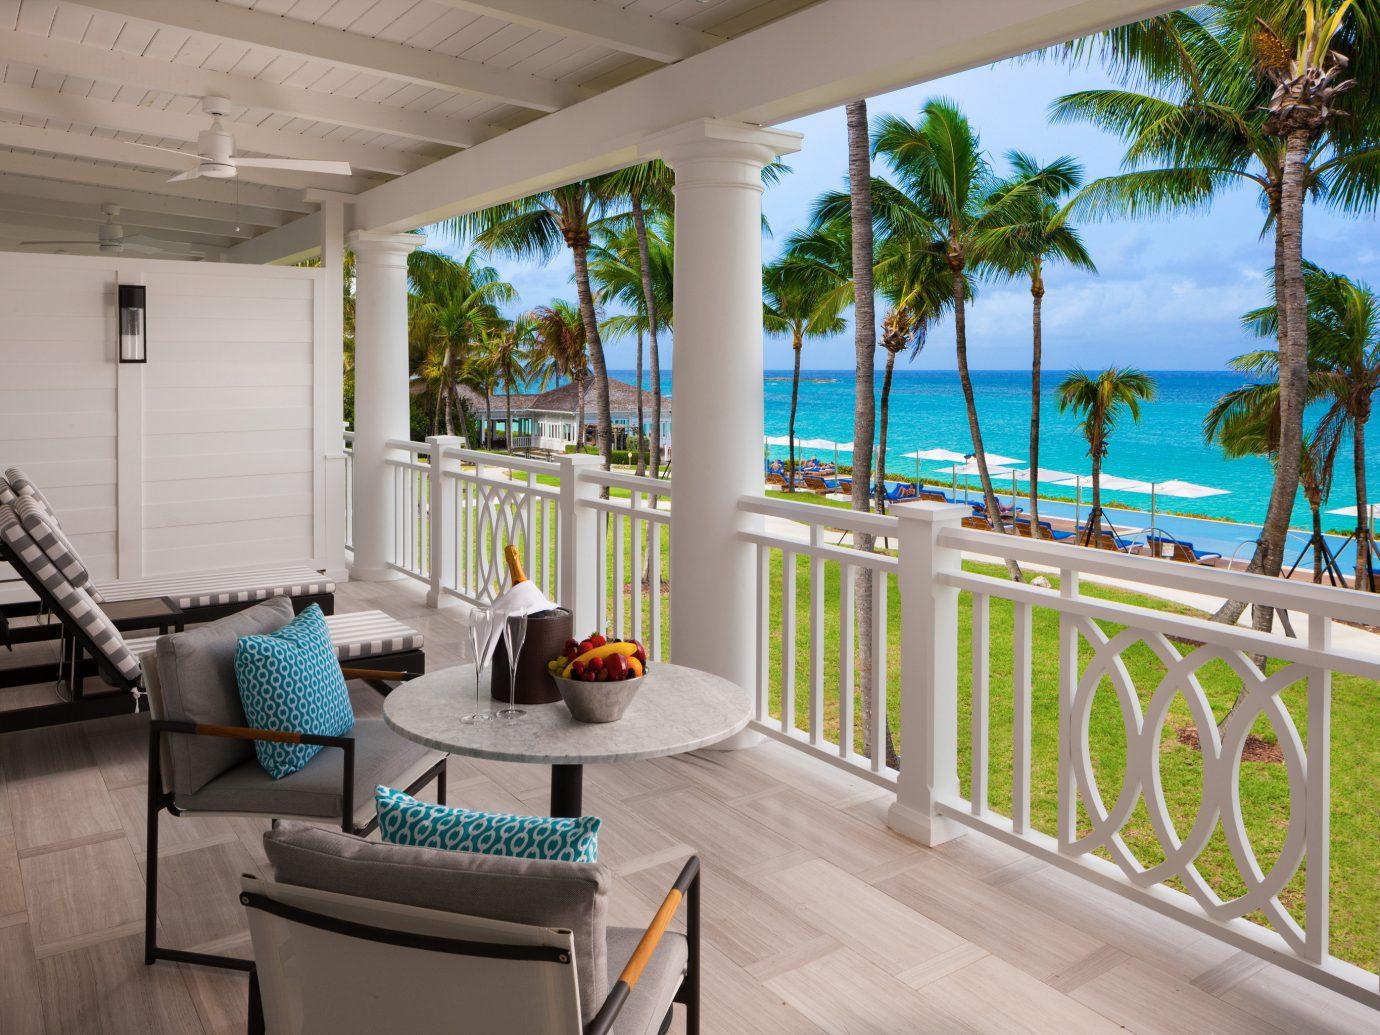 Balcony overlooking the ocean at Four Seasons Ocean Club Bahamas